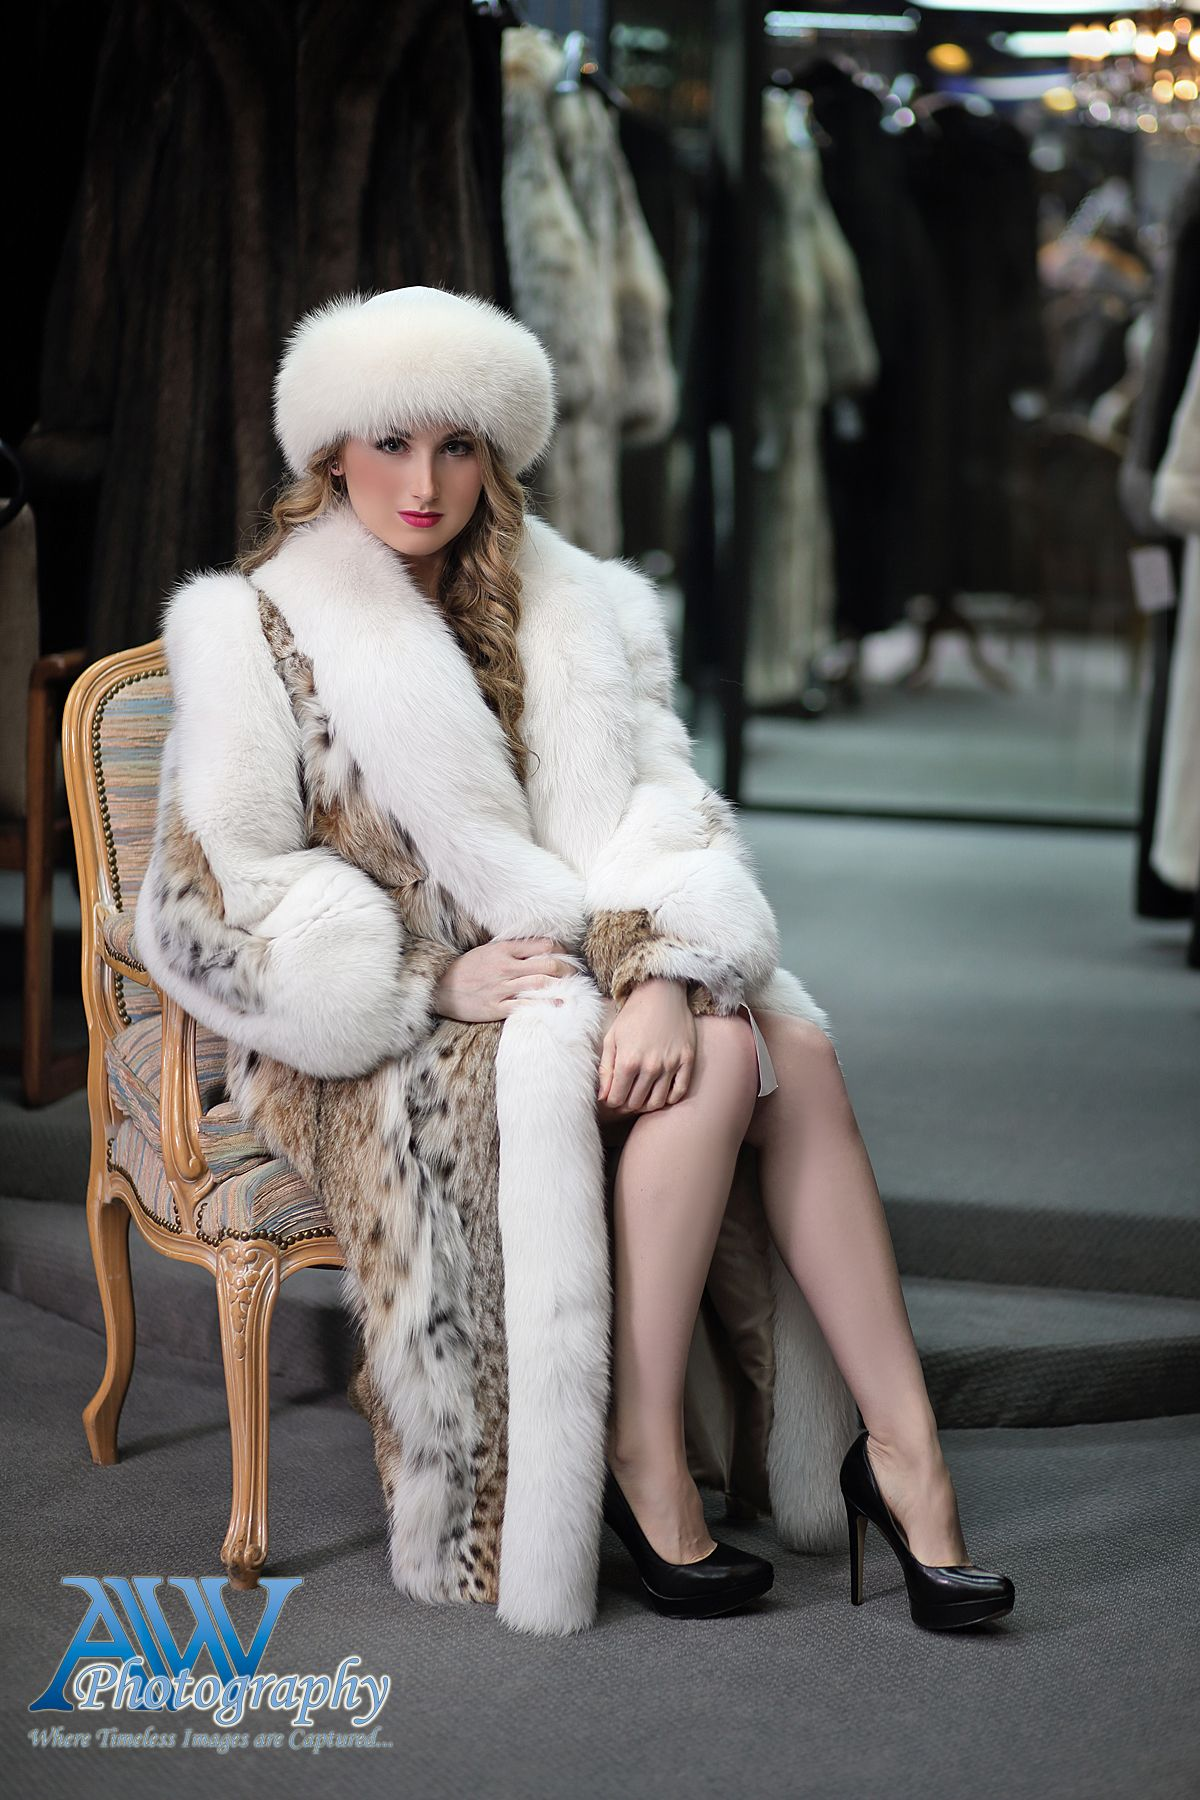 Pin By Chris Norman On Fur 18 Fur Fur Clothing Coat